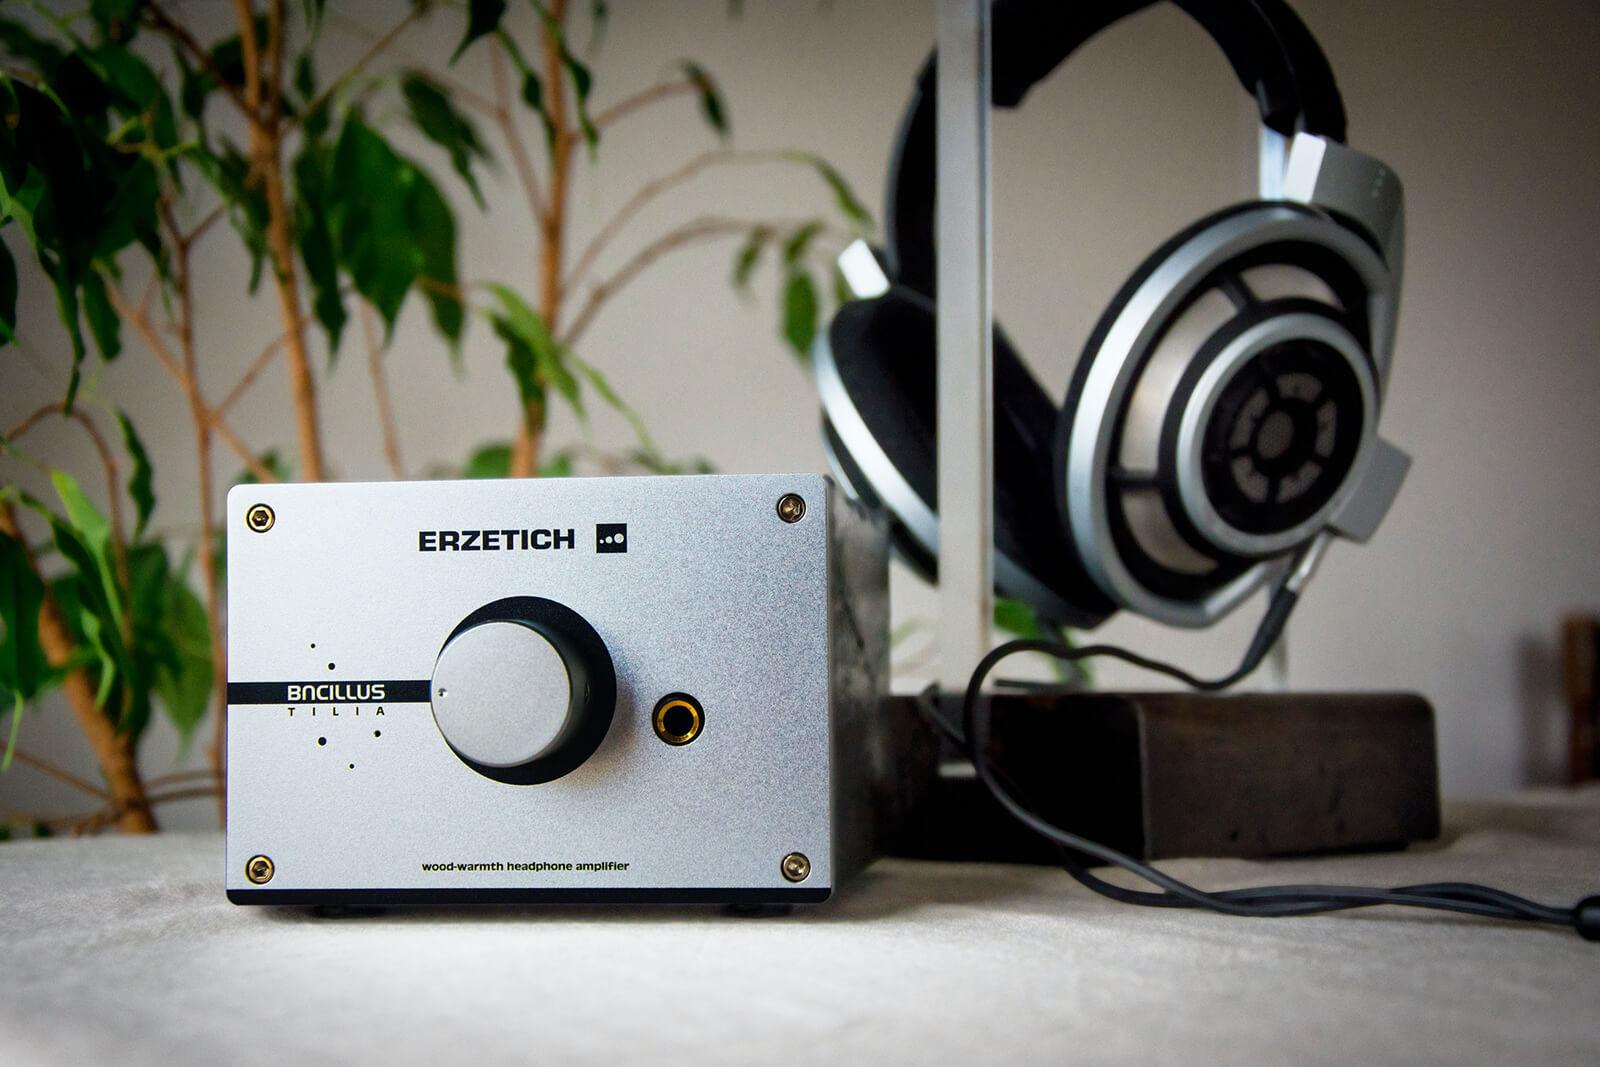 Best headphone amp under $100